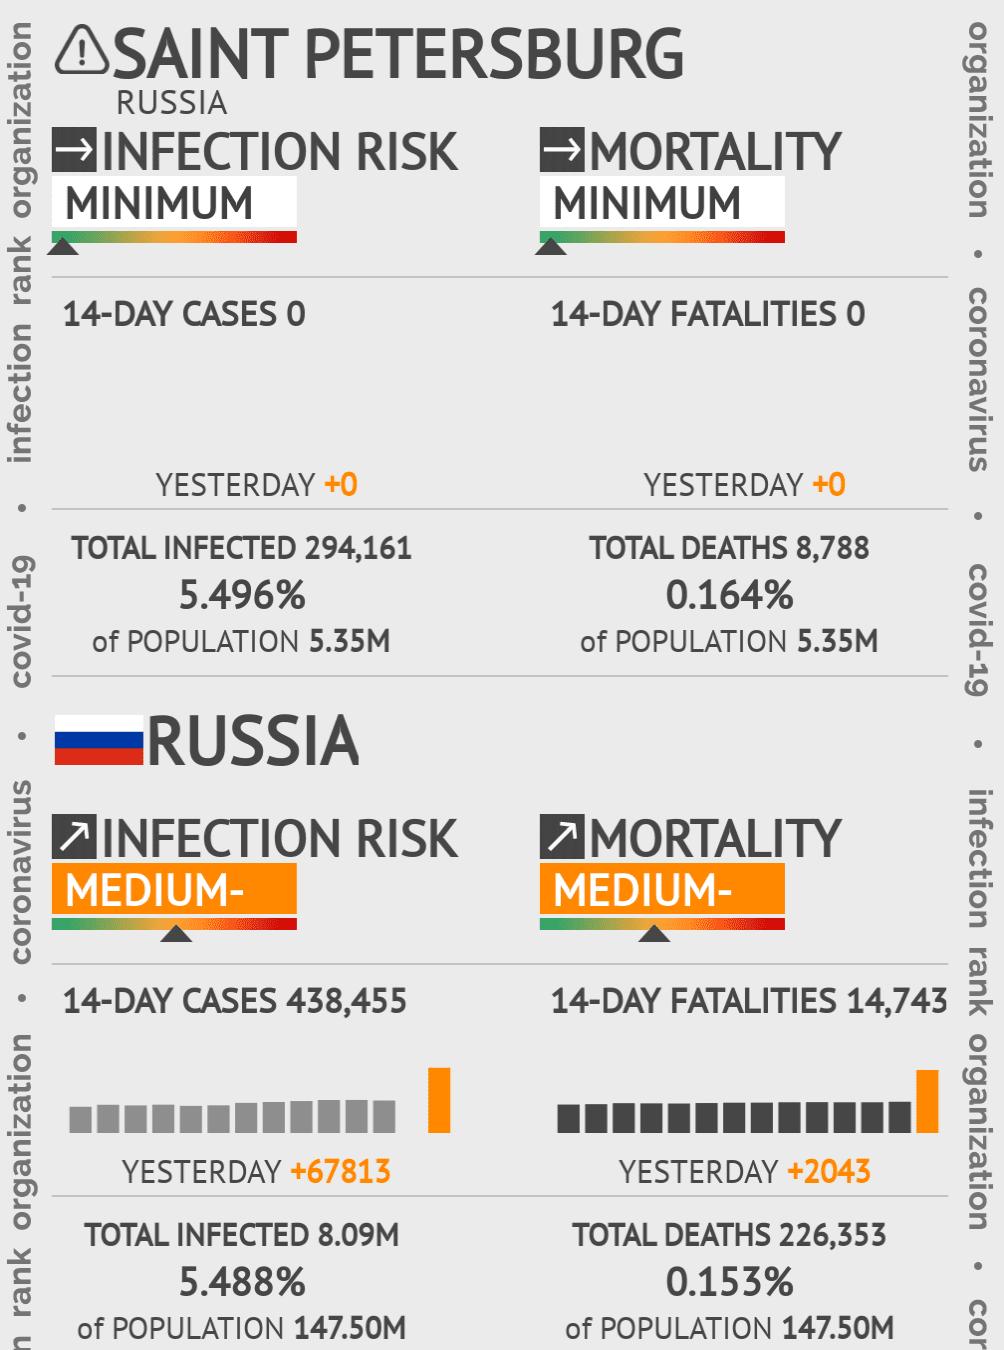 Saint Petersburg Coronavirus Covid-19 Risk of Infection on February 23, 2021